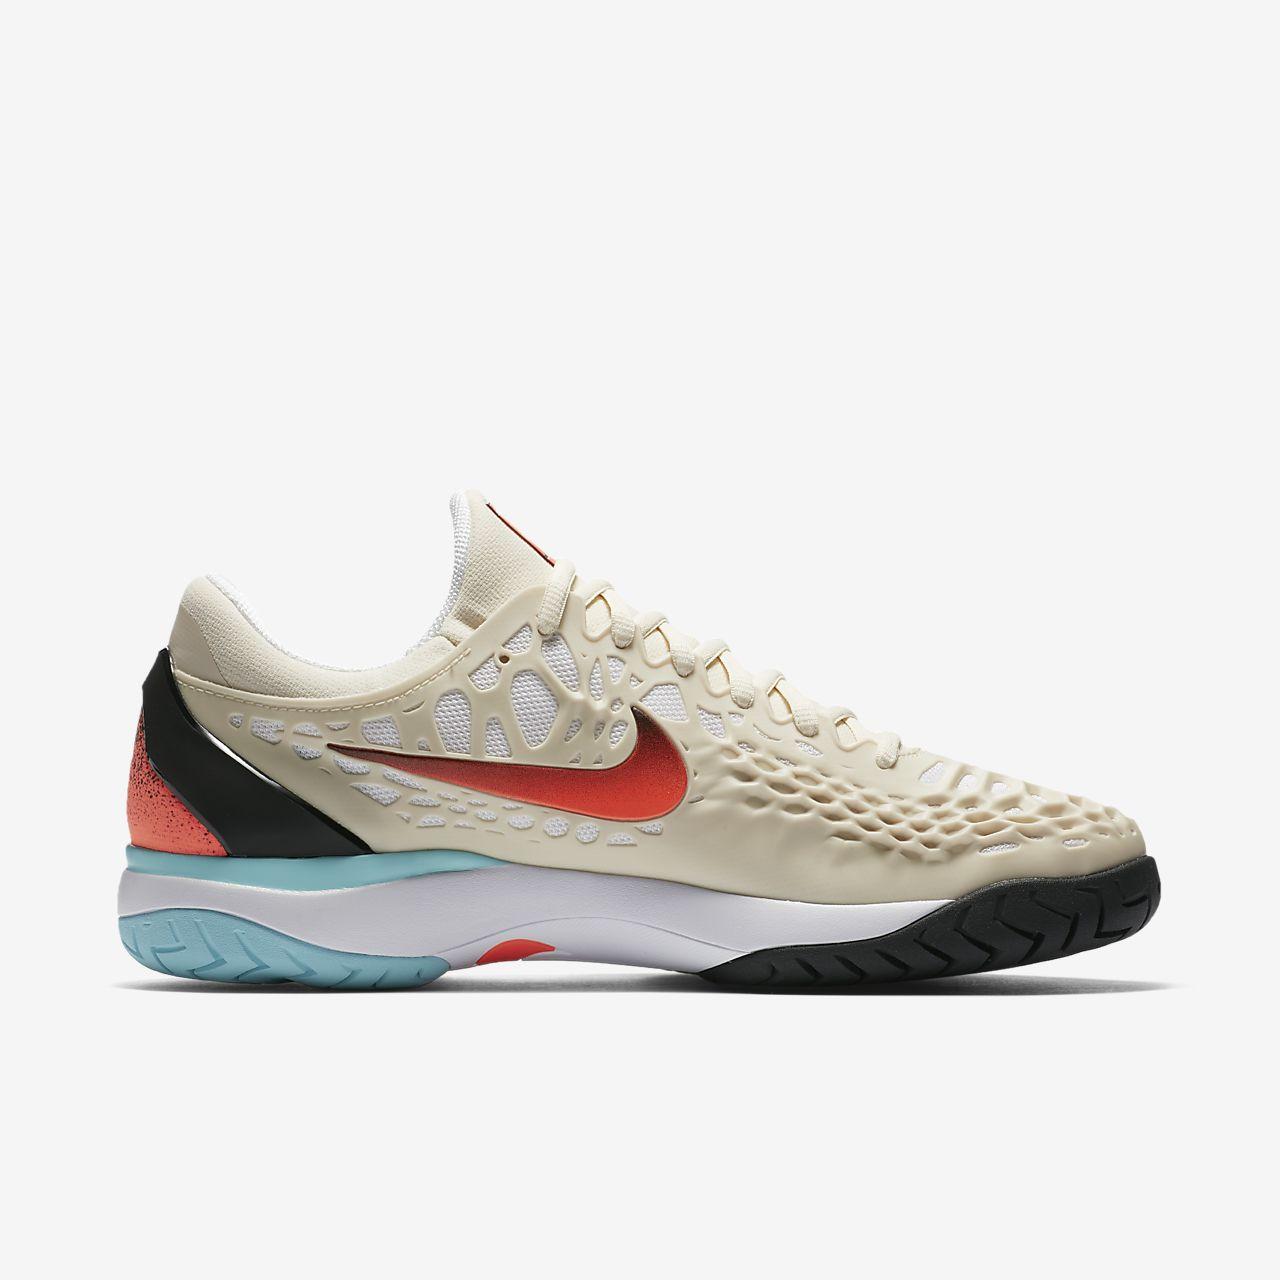 Zoom Air Cb1zxr De Nike Cage 3 Hc Chaussure Pour Hommes Tennis nPXON8kZ0w